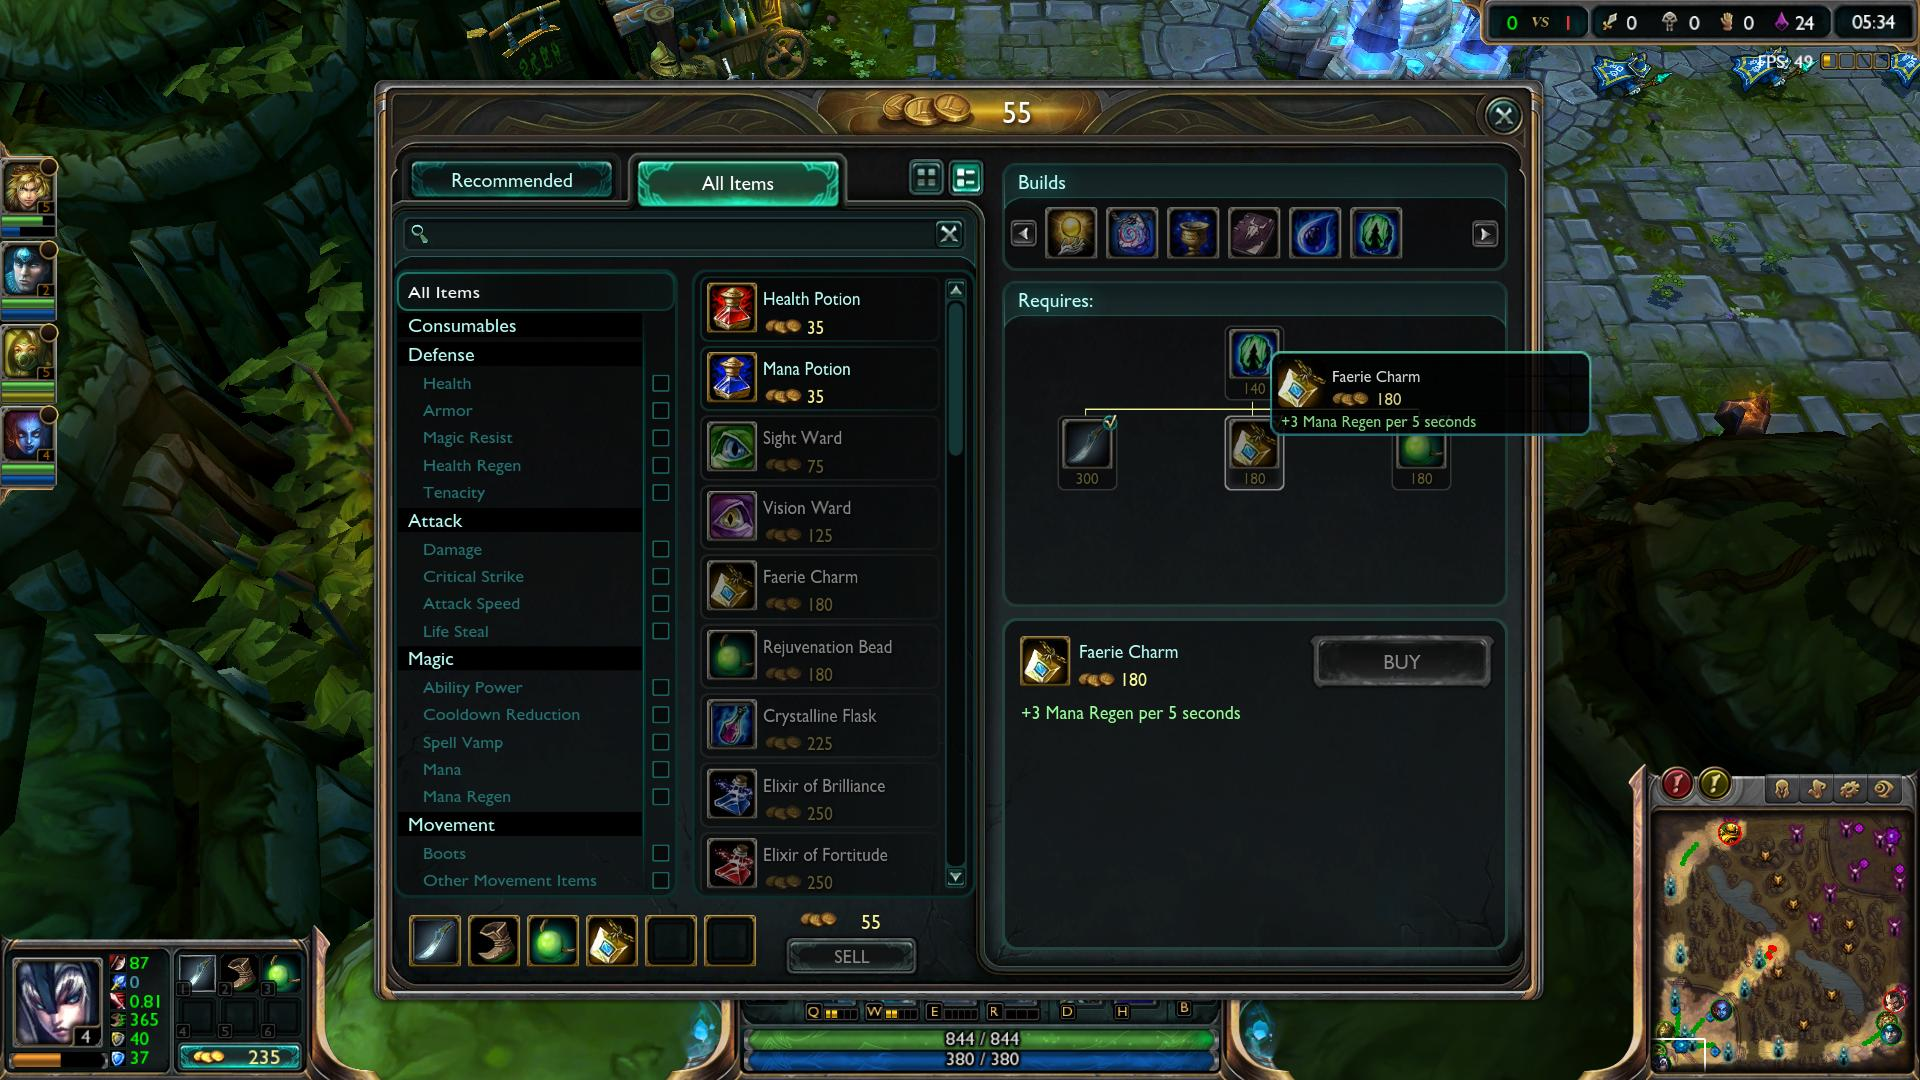 lol Faerie Charm item lol screenshot - Gamingcfg com